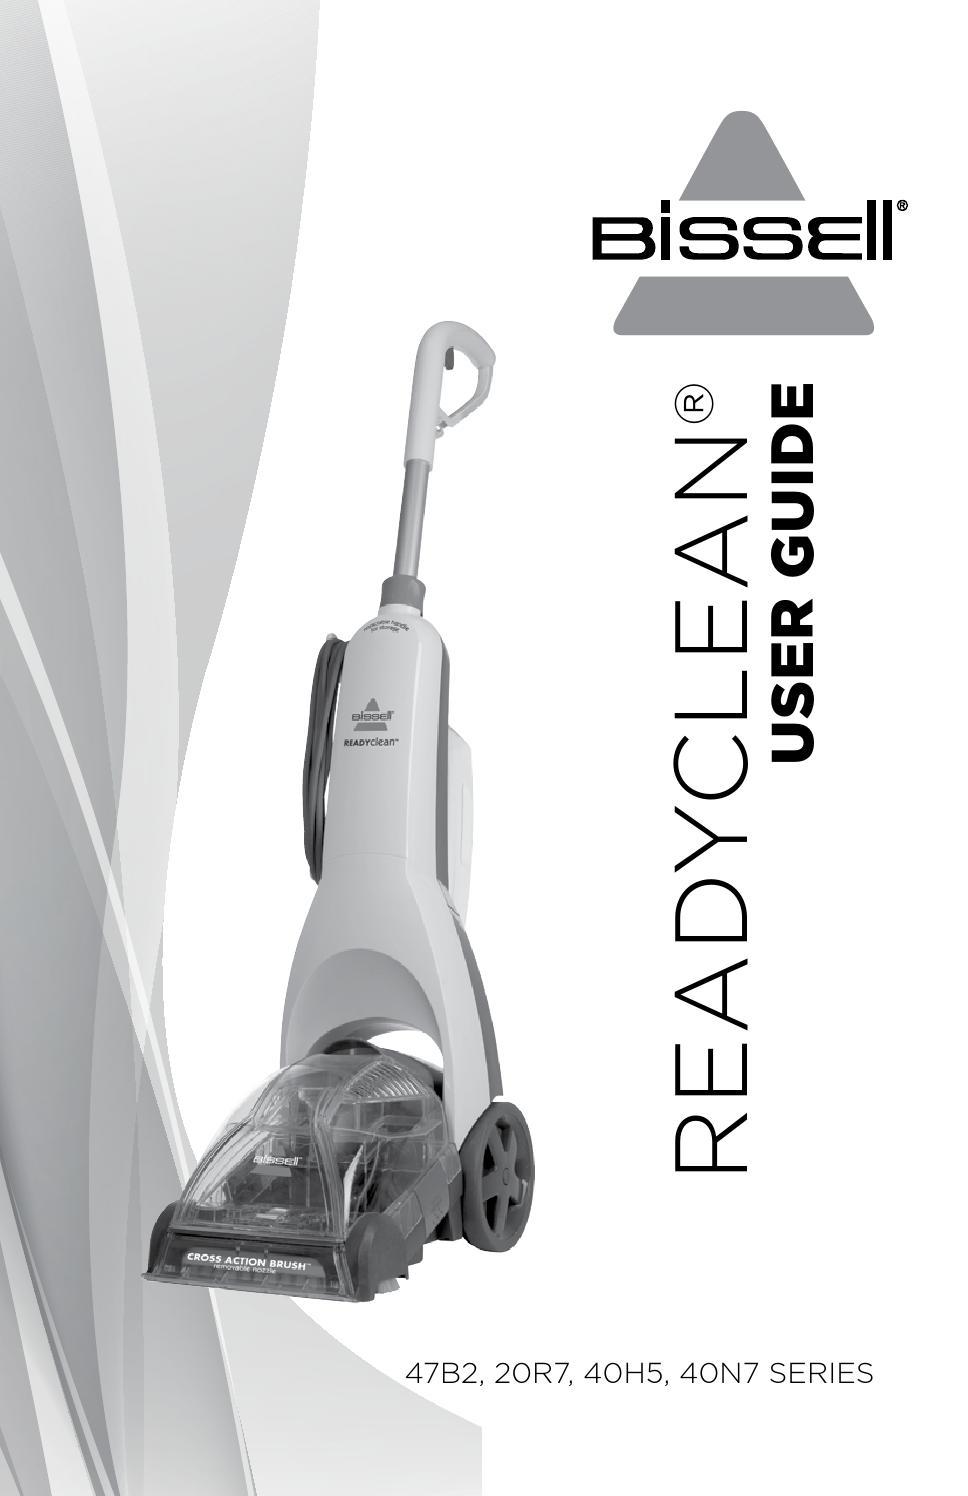 Bissell Readyclean Powerbrush Carpet Cleaner 47b2 Manual